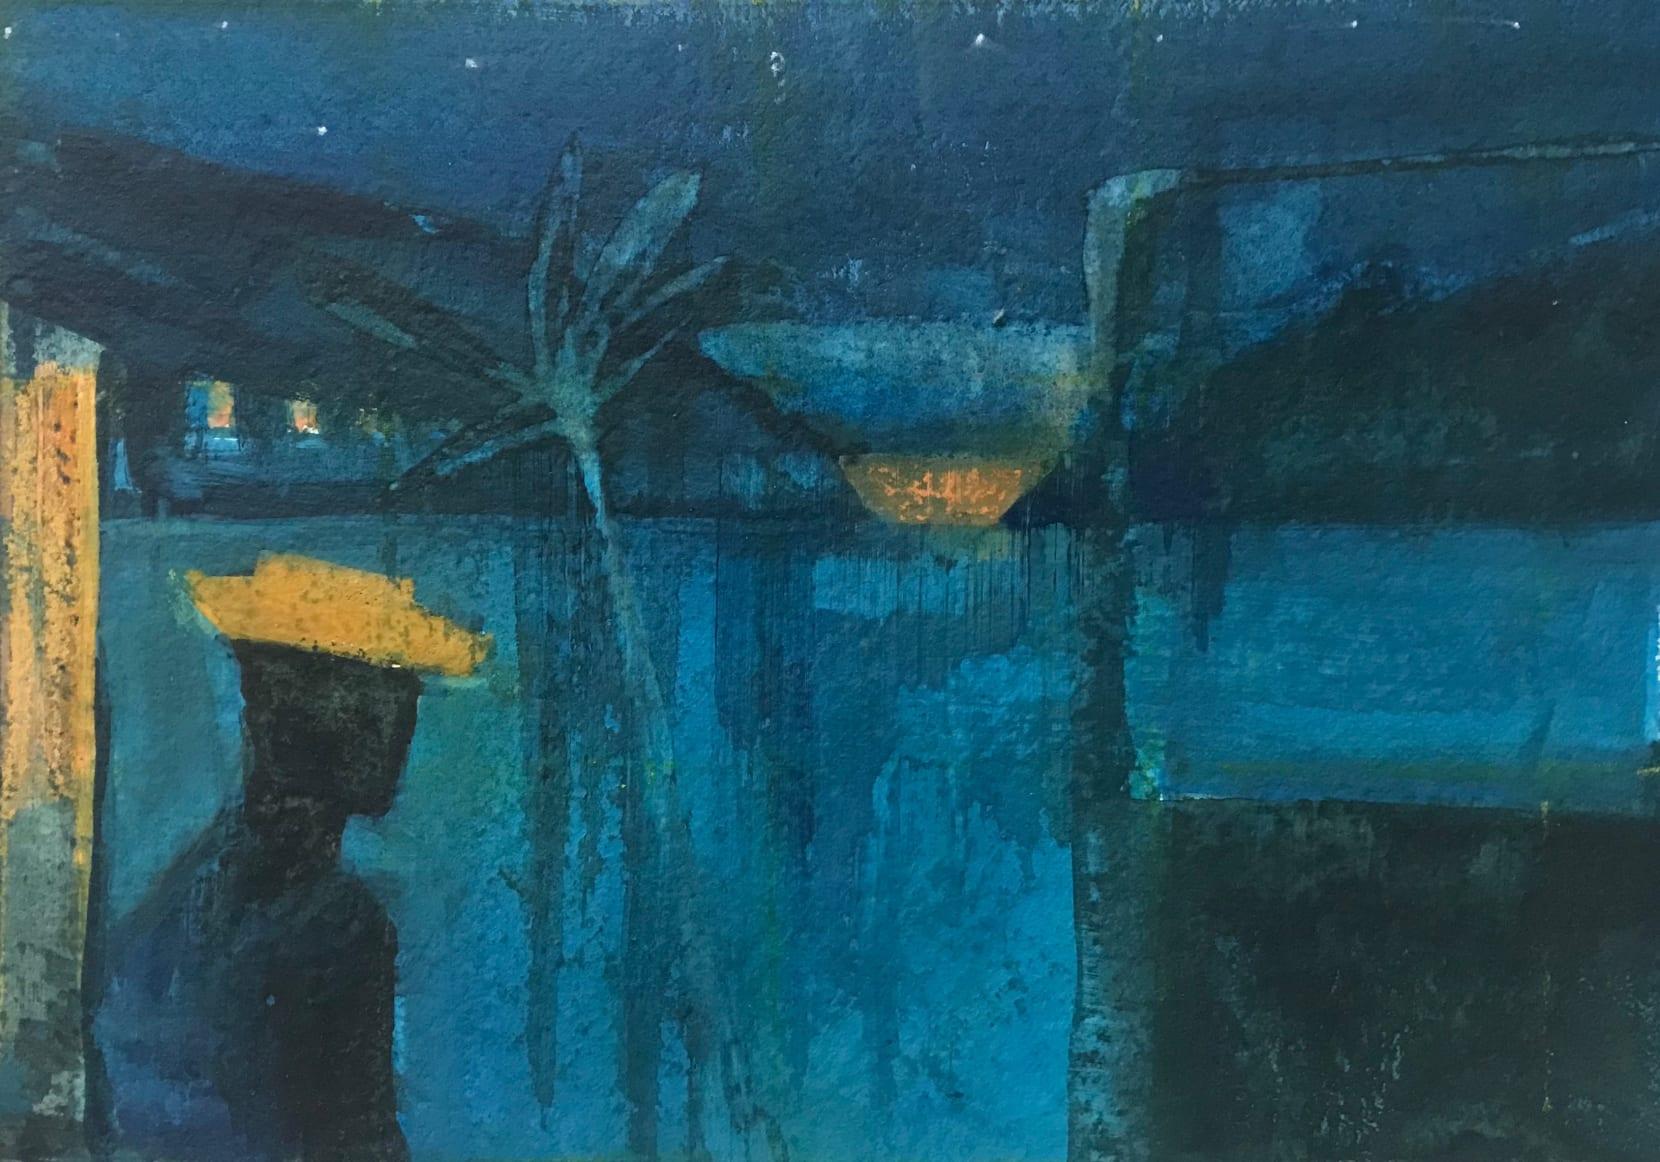 Pippa Blake, Caribbean Nights (after Derek Walcott)